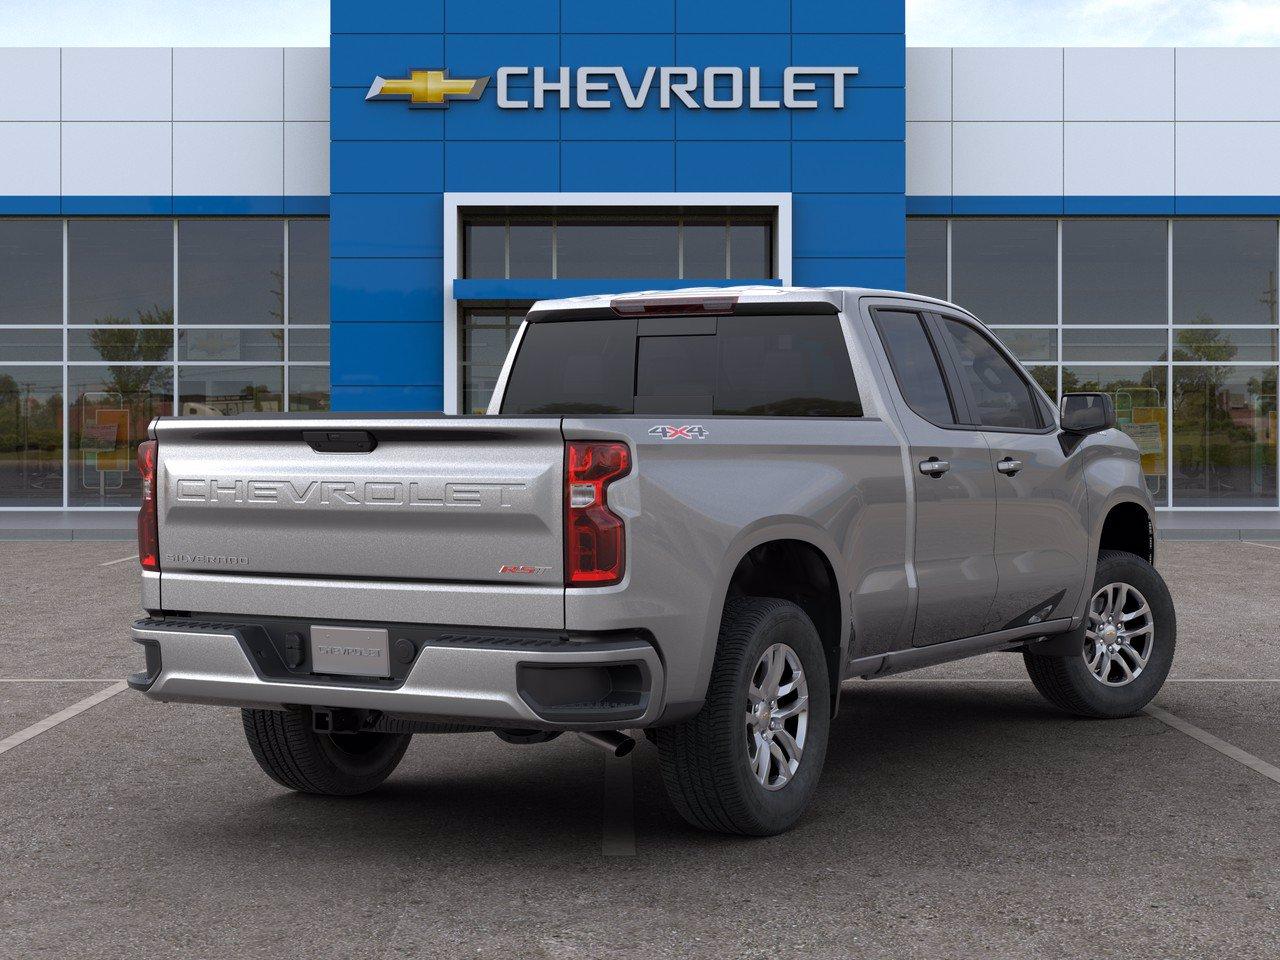 2020 Chevrolet Silverado 1500 Double Cab 4x4, Pickup #C201513 - photo 2